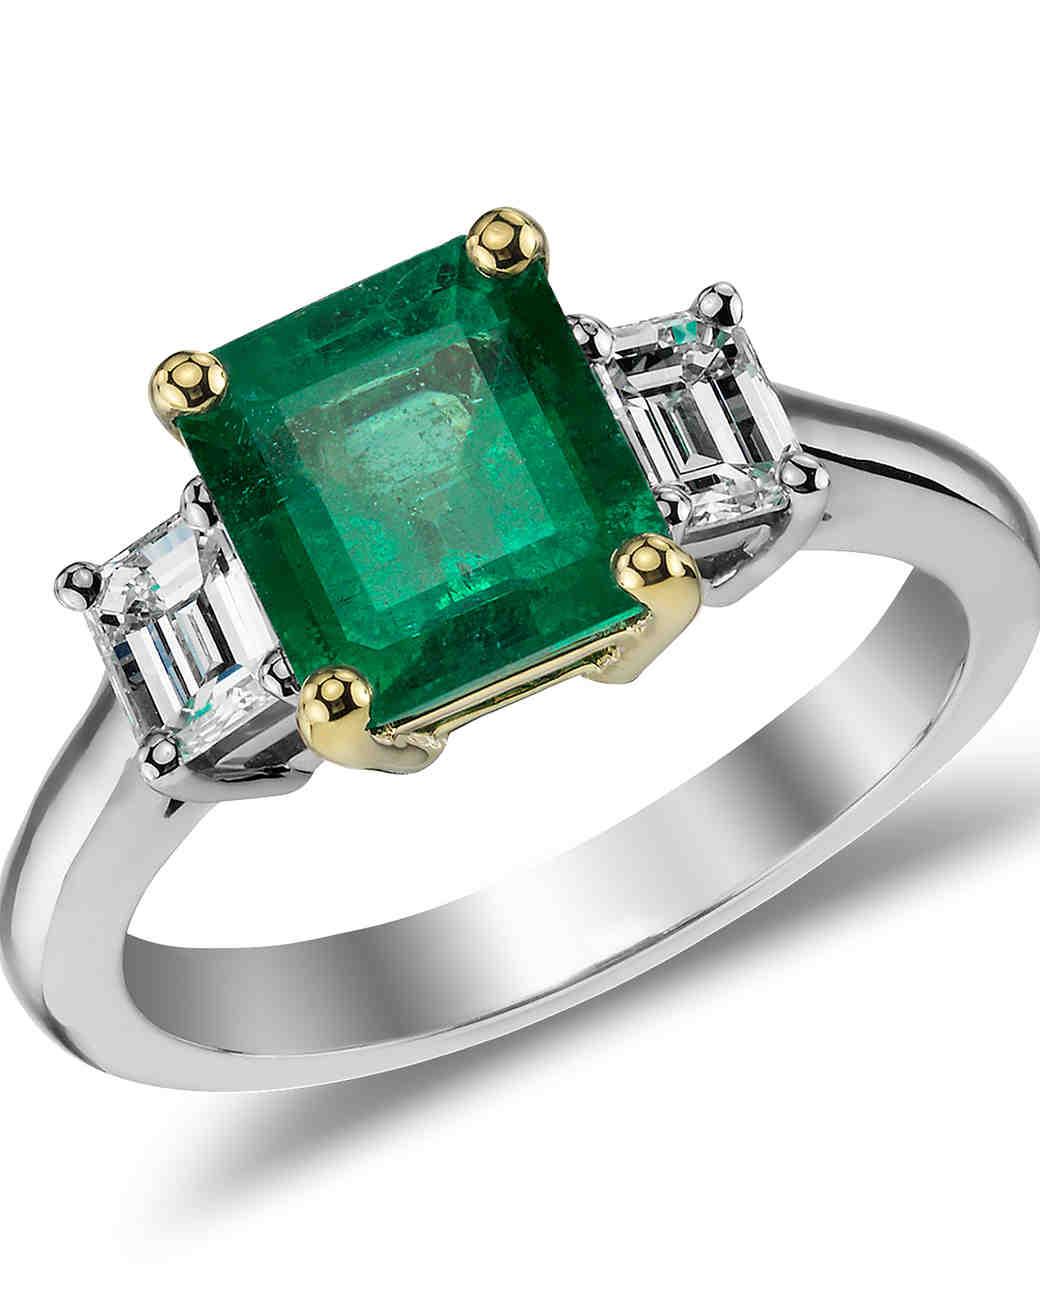 Blue Nile Emerald Engagement Ring